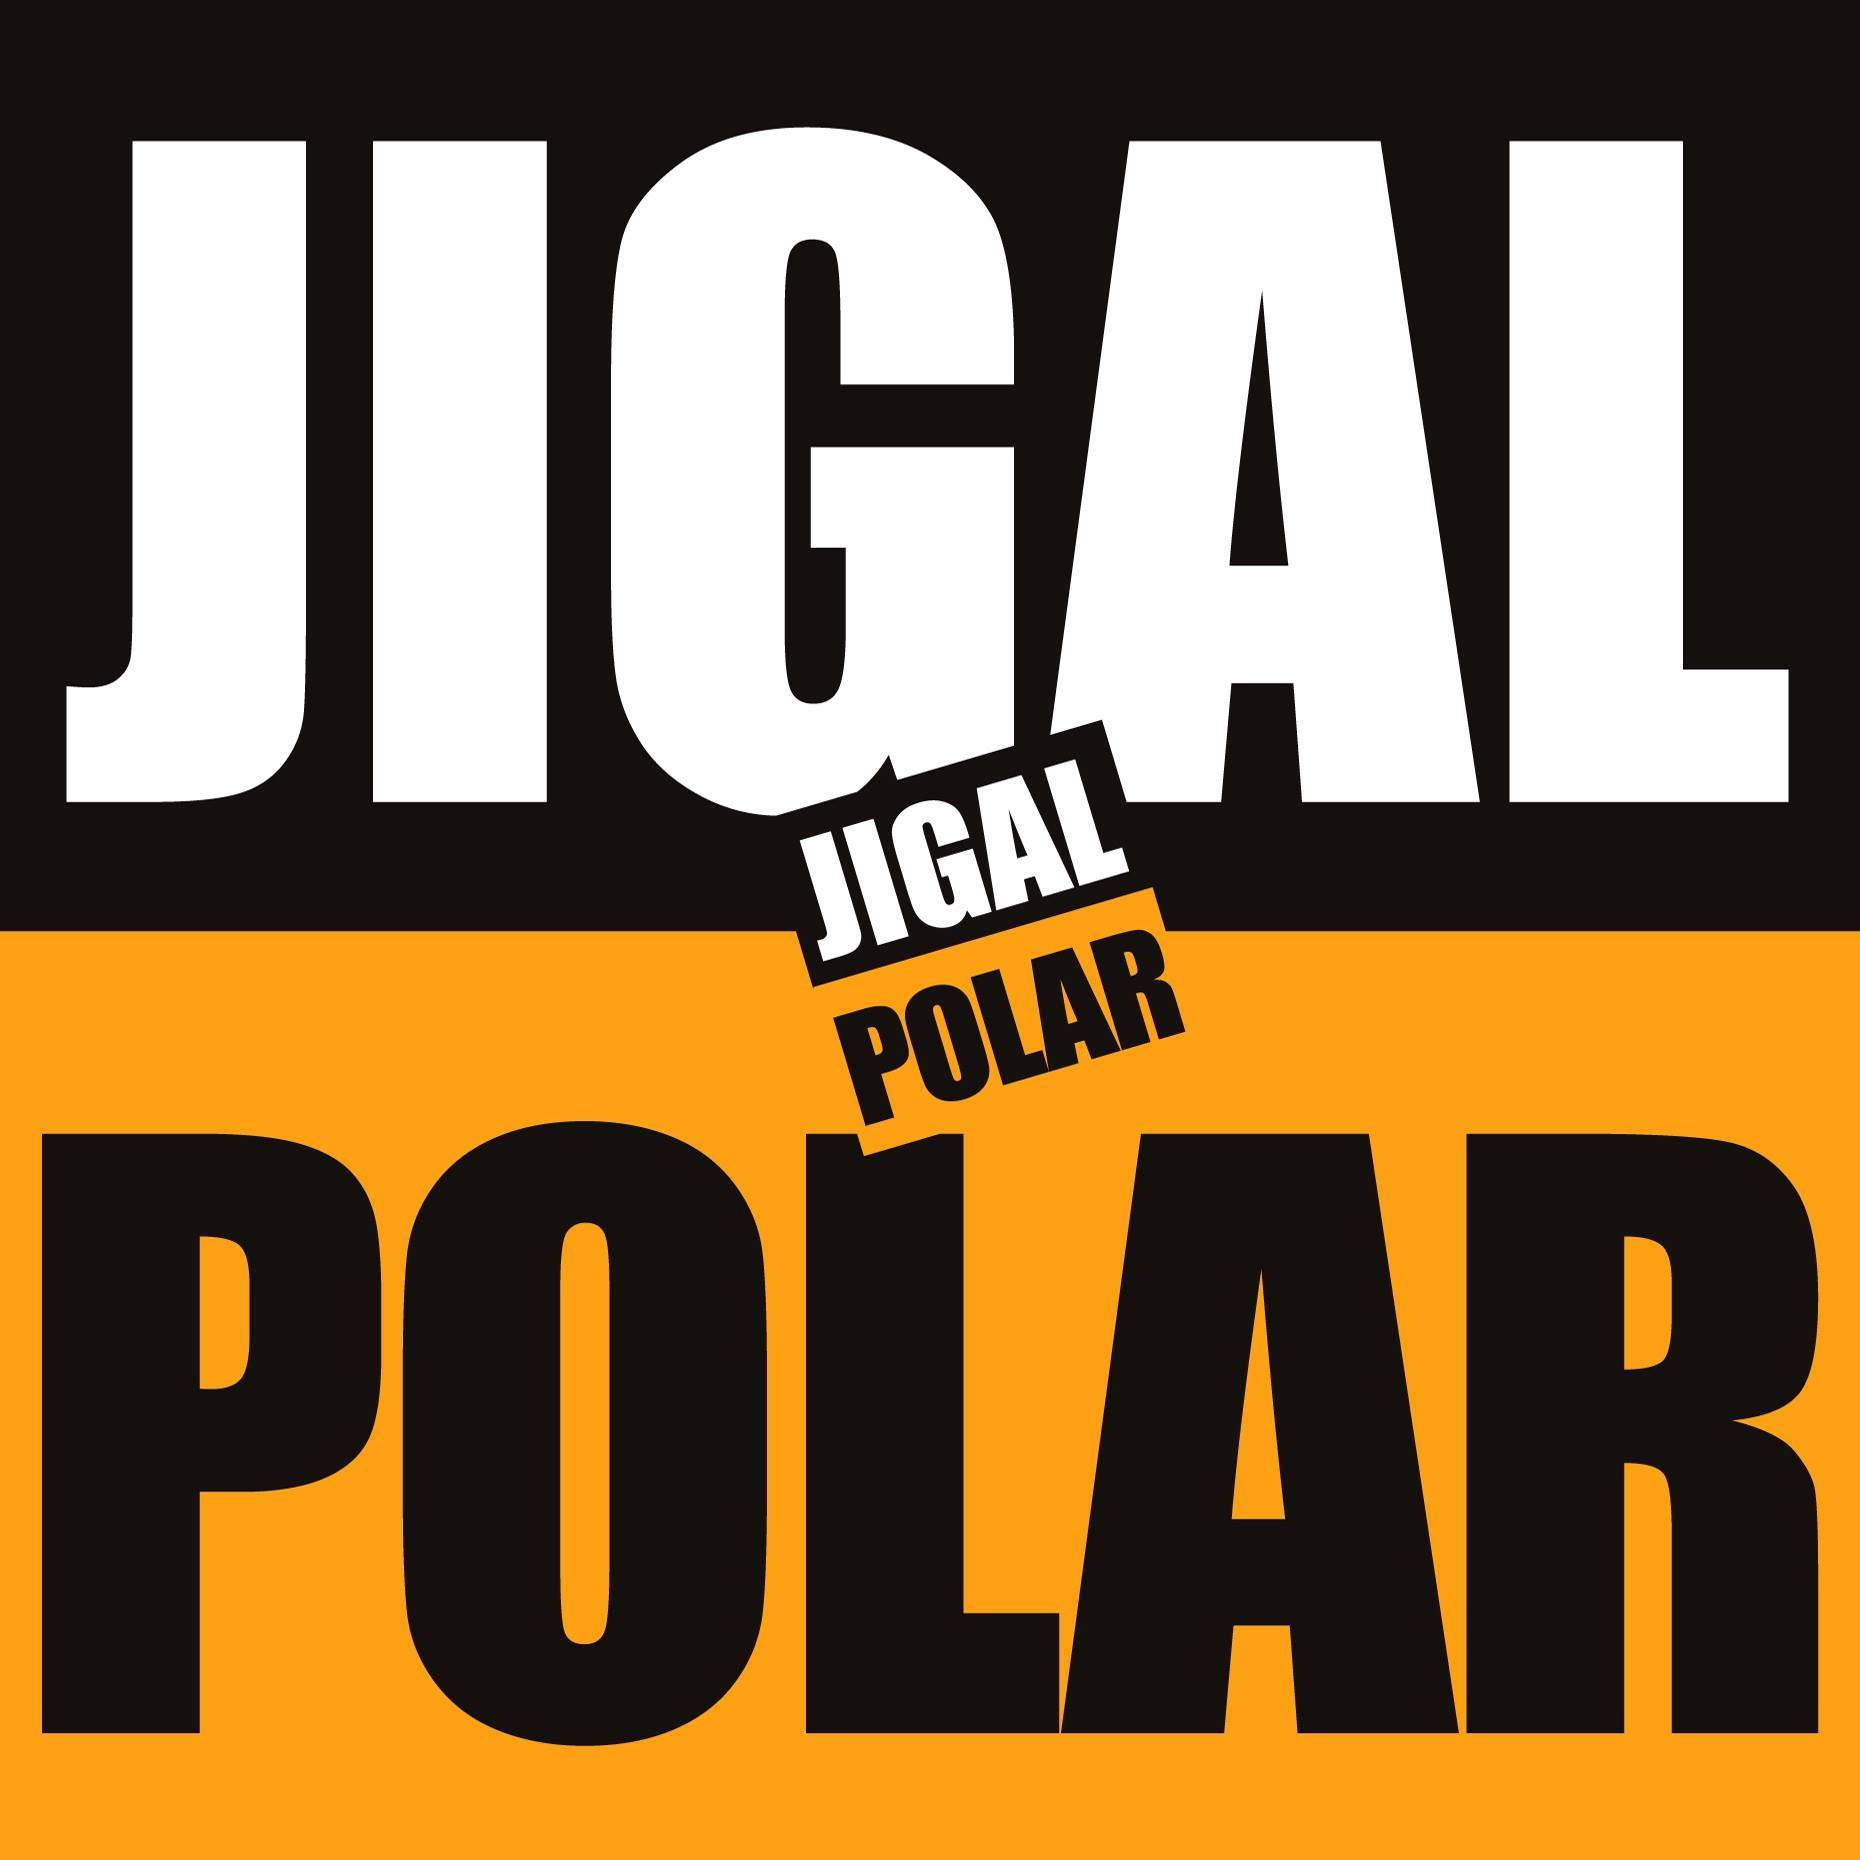 Jigal